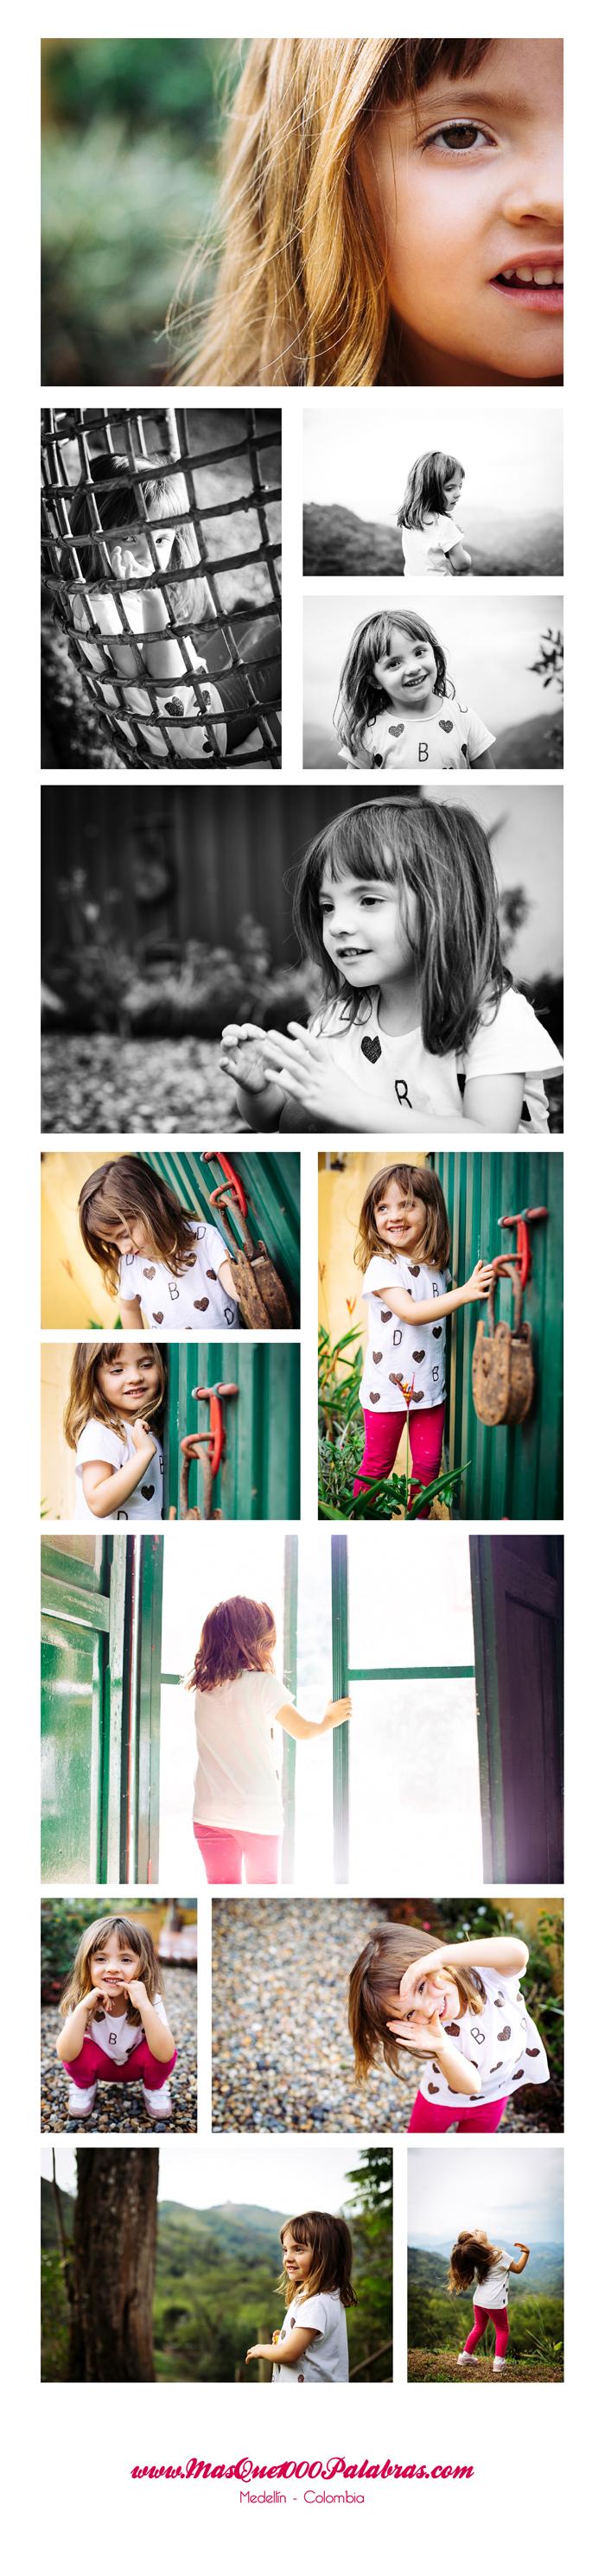 fotoestudios infantiles en Medellin